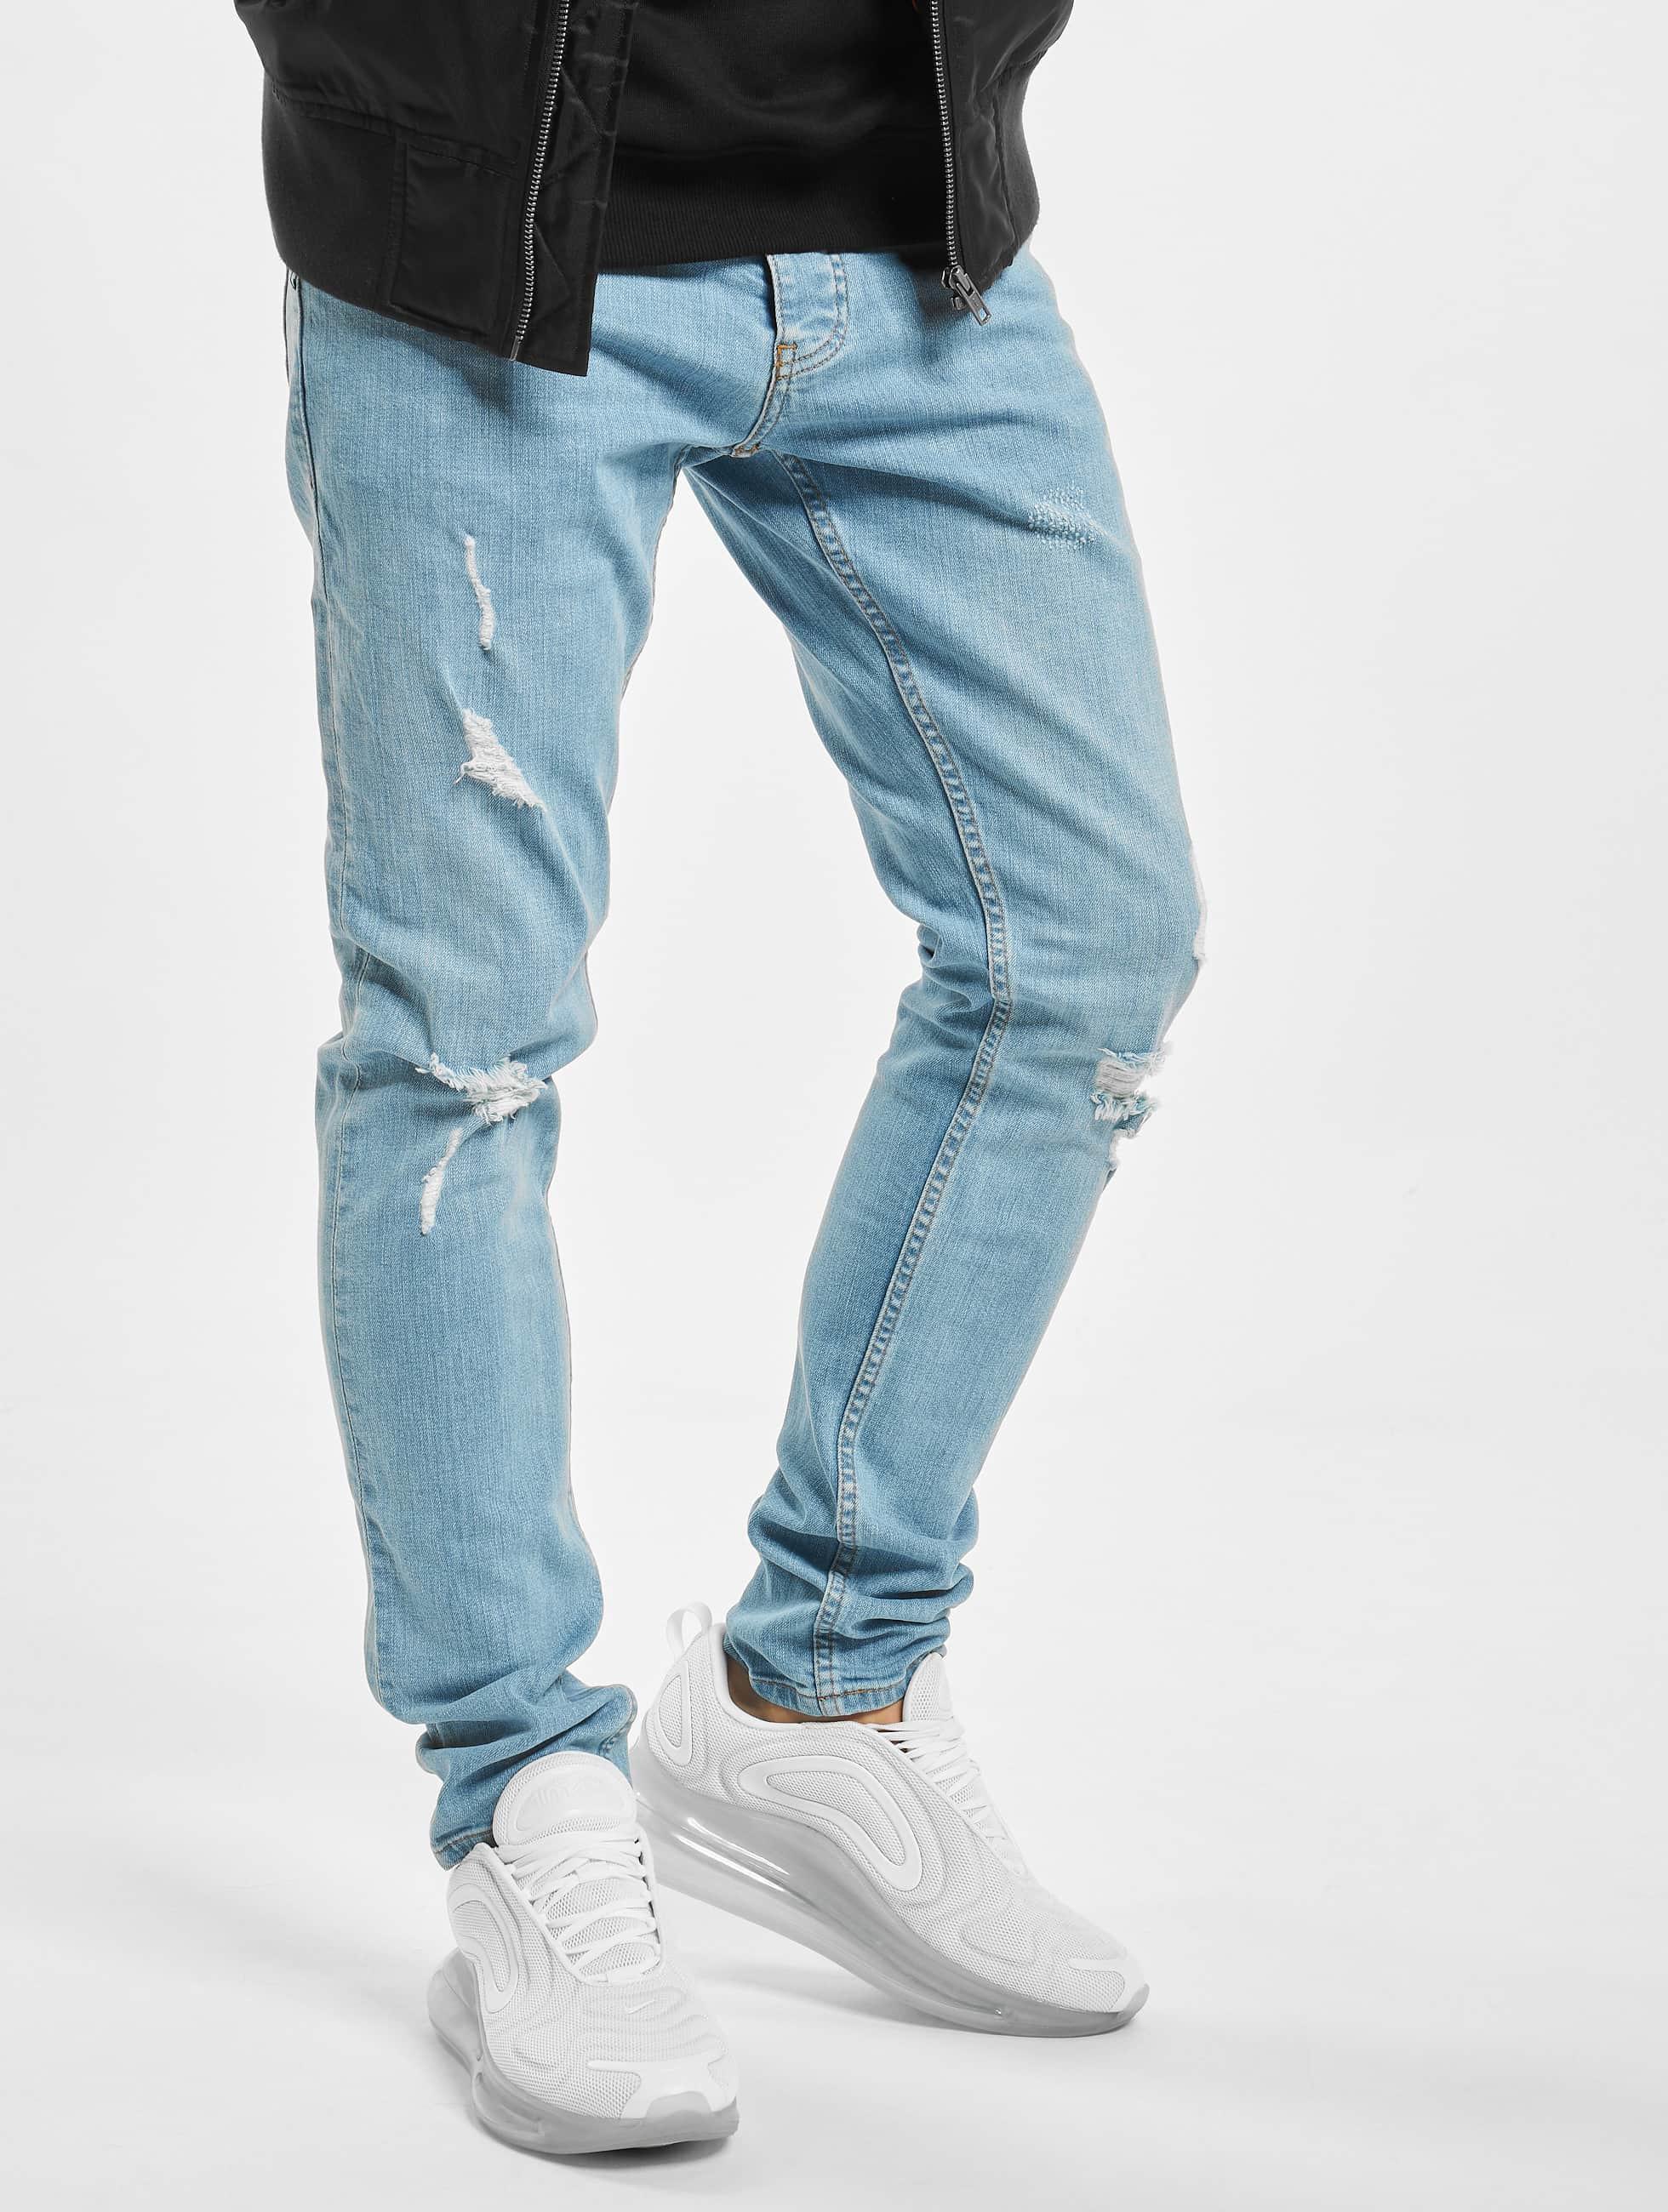 2Y / Slim Fit Jeans Yven in blue W 34